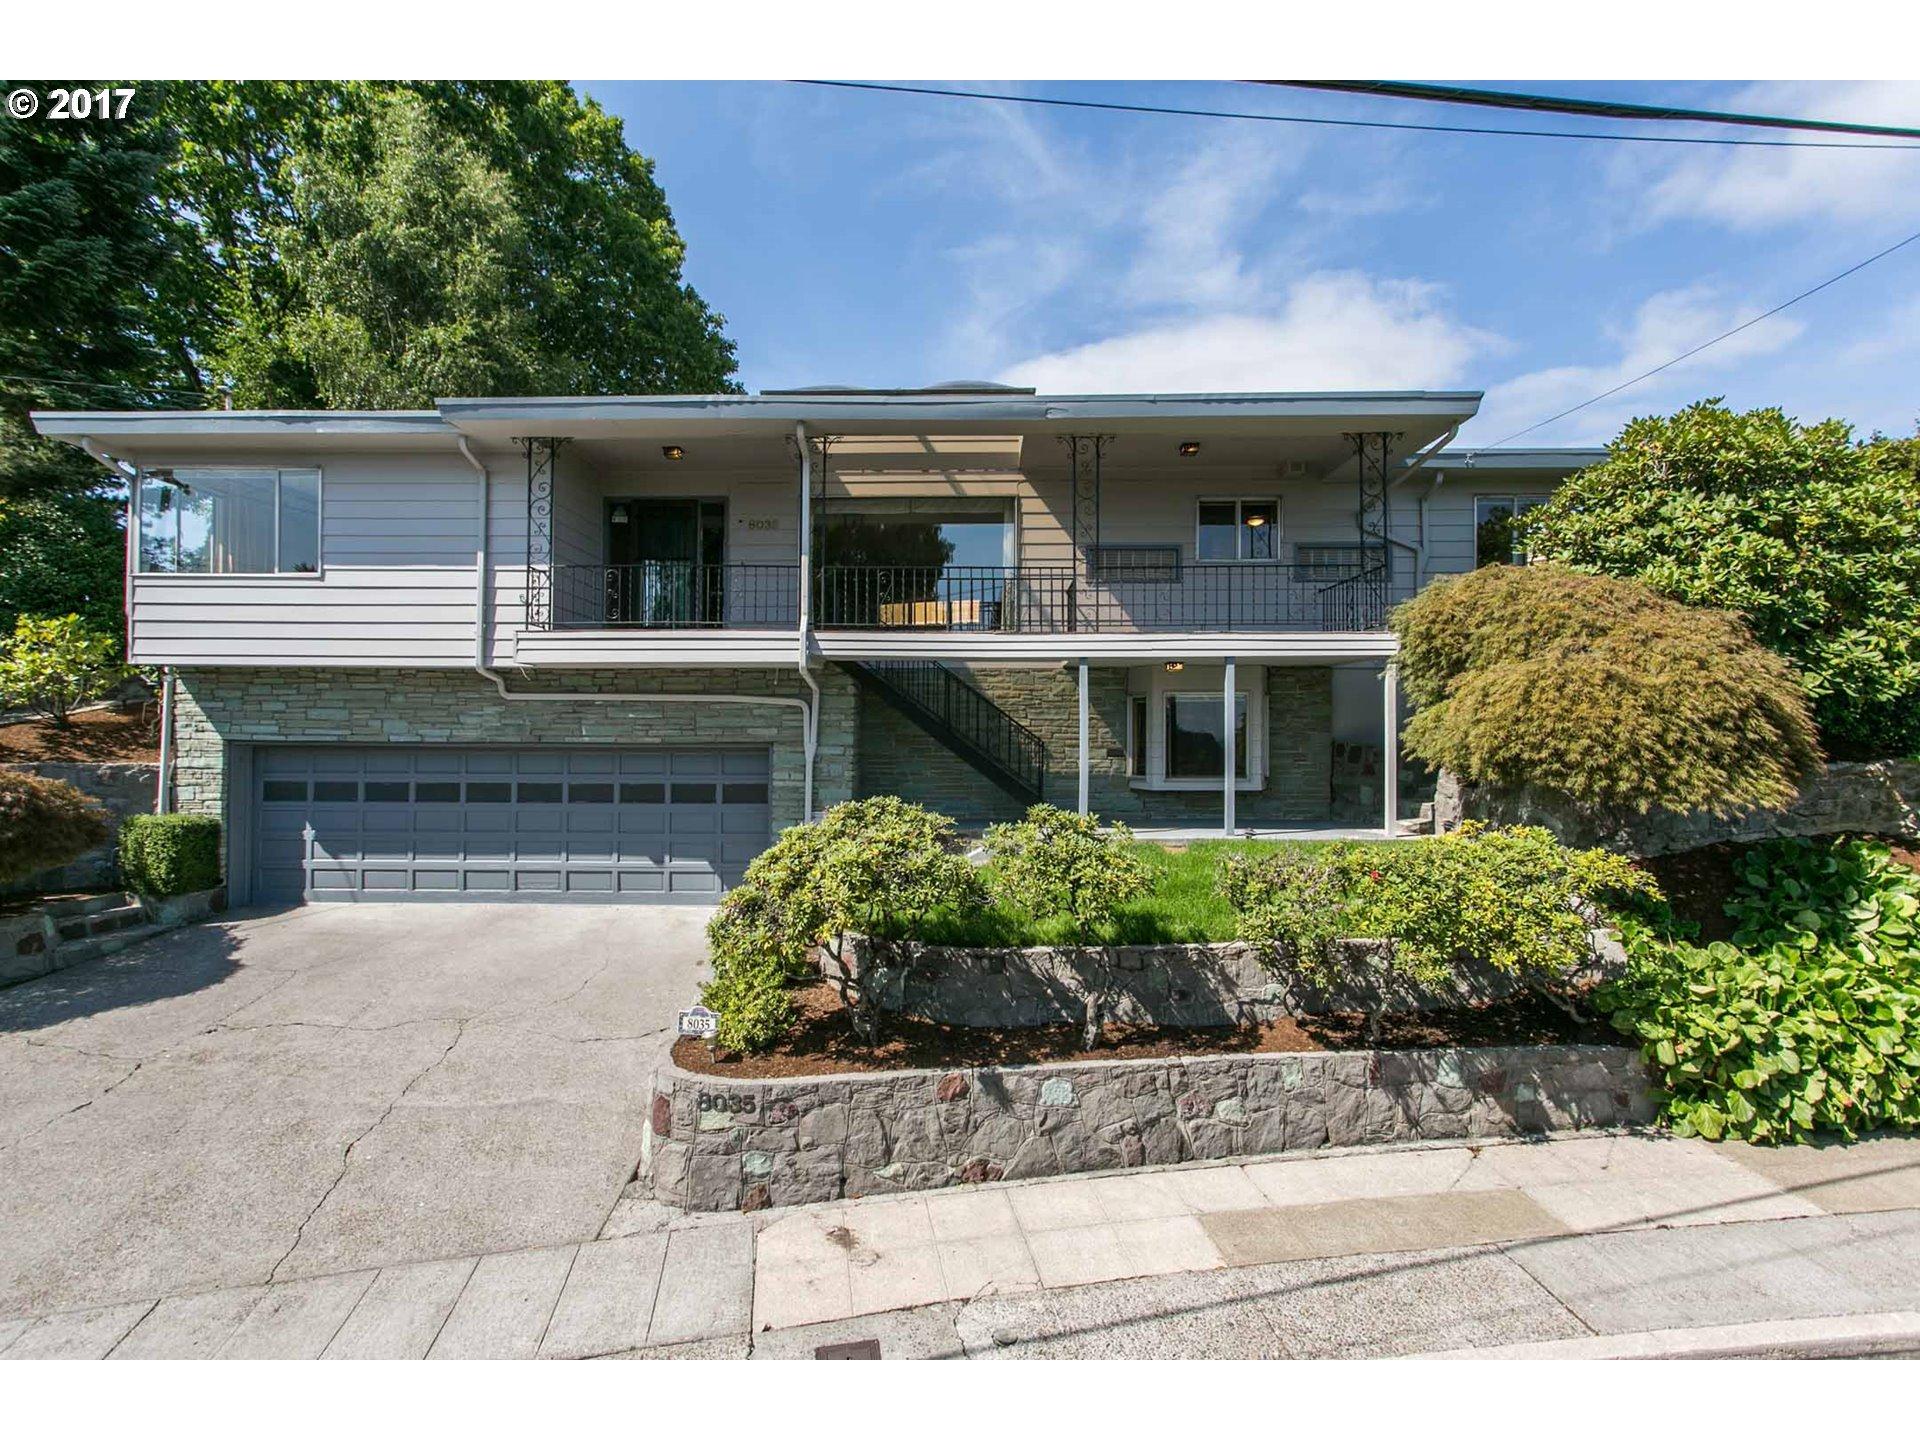 8035 Sw Burlingame Ave Portland Or 97219 Living Room Realty Portland Real Estate